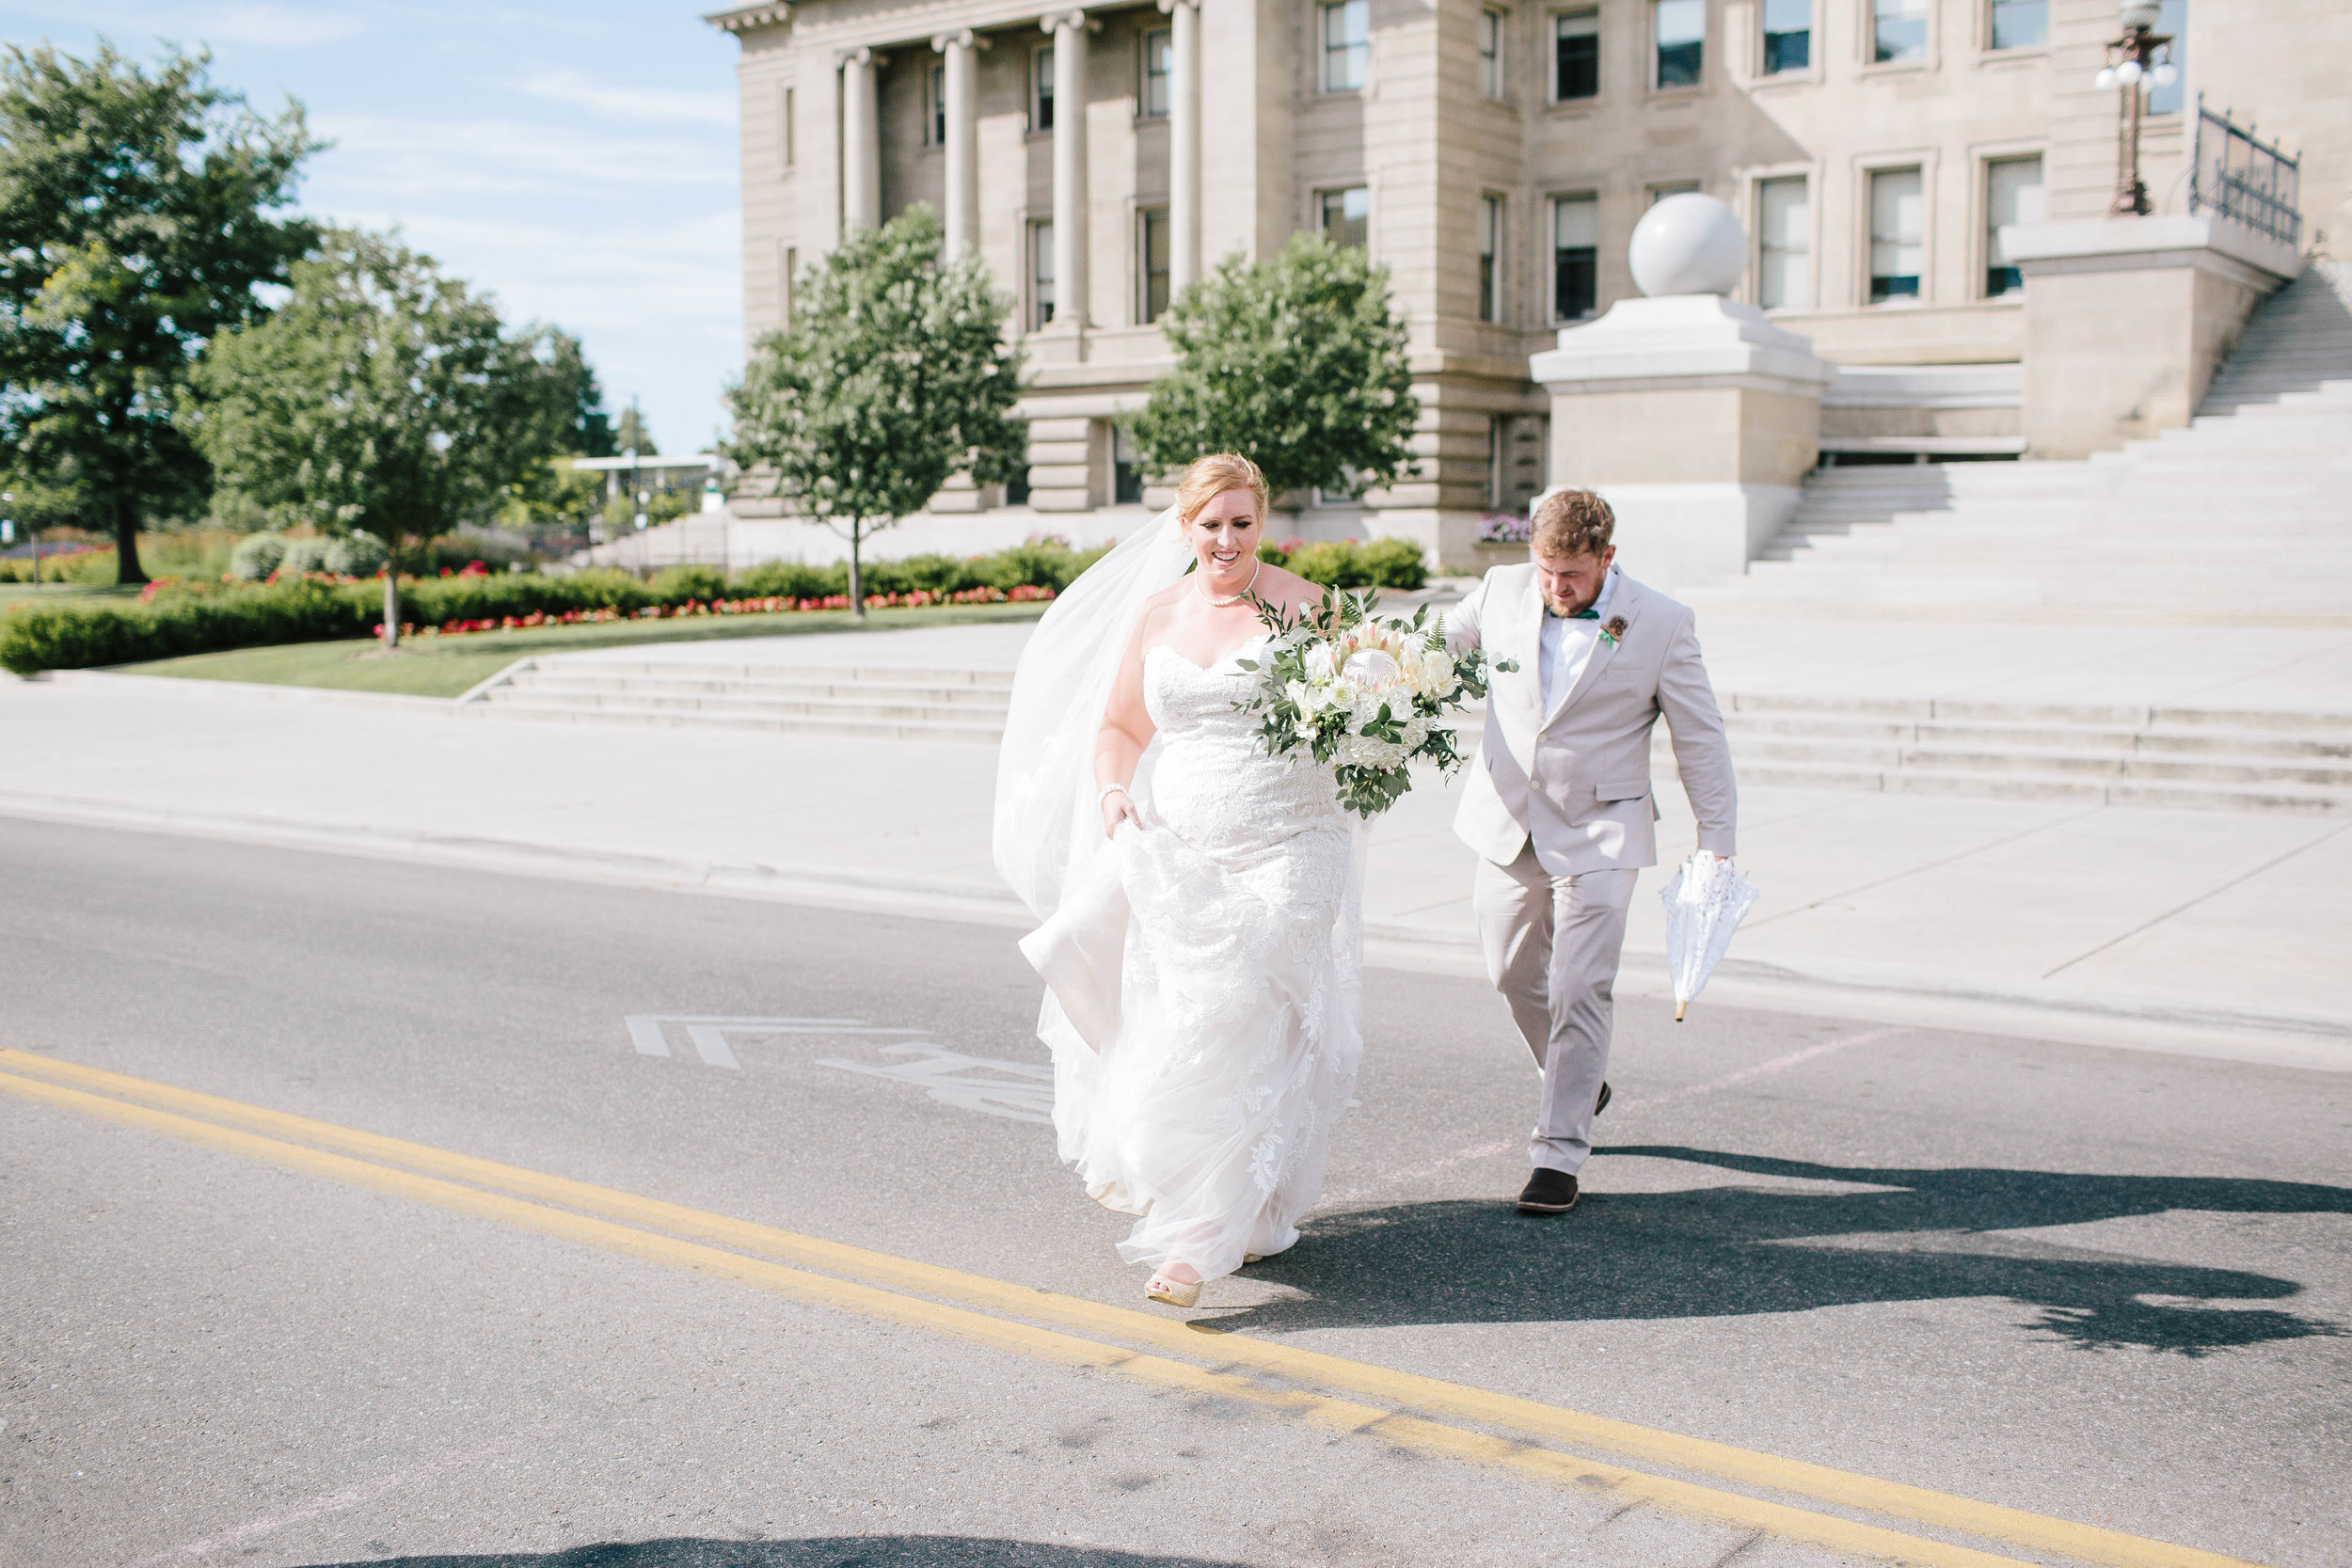 C-Lydia-Rohan-Downtown-Boise-Wedding-59.jpg